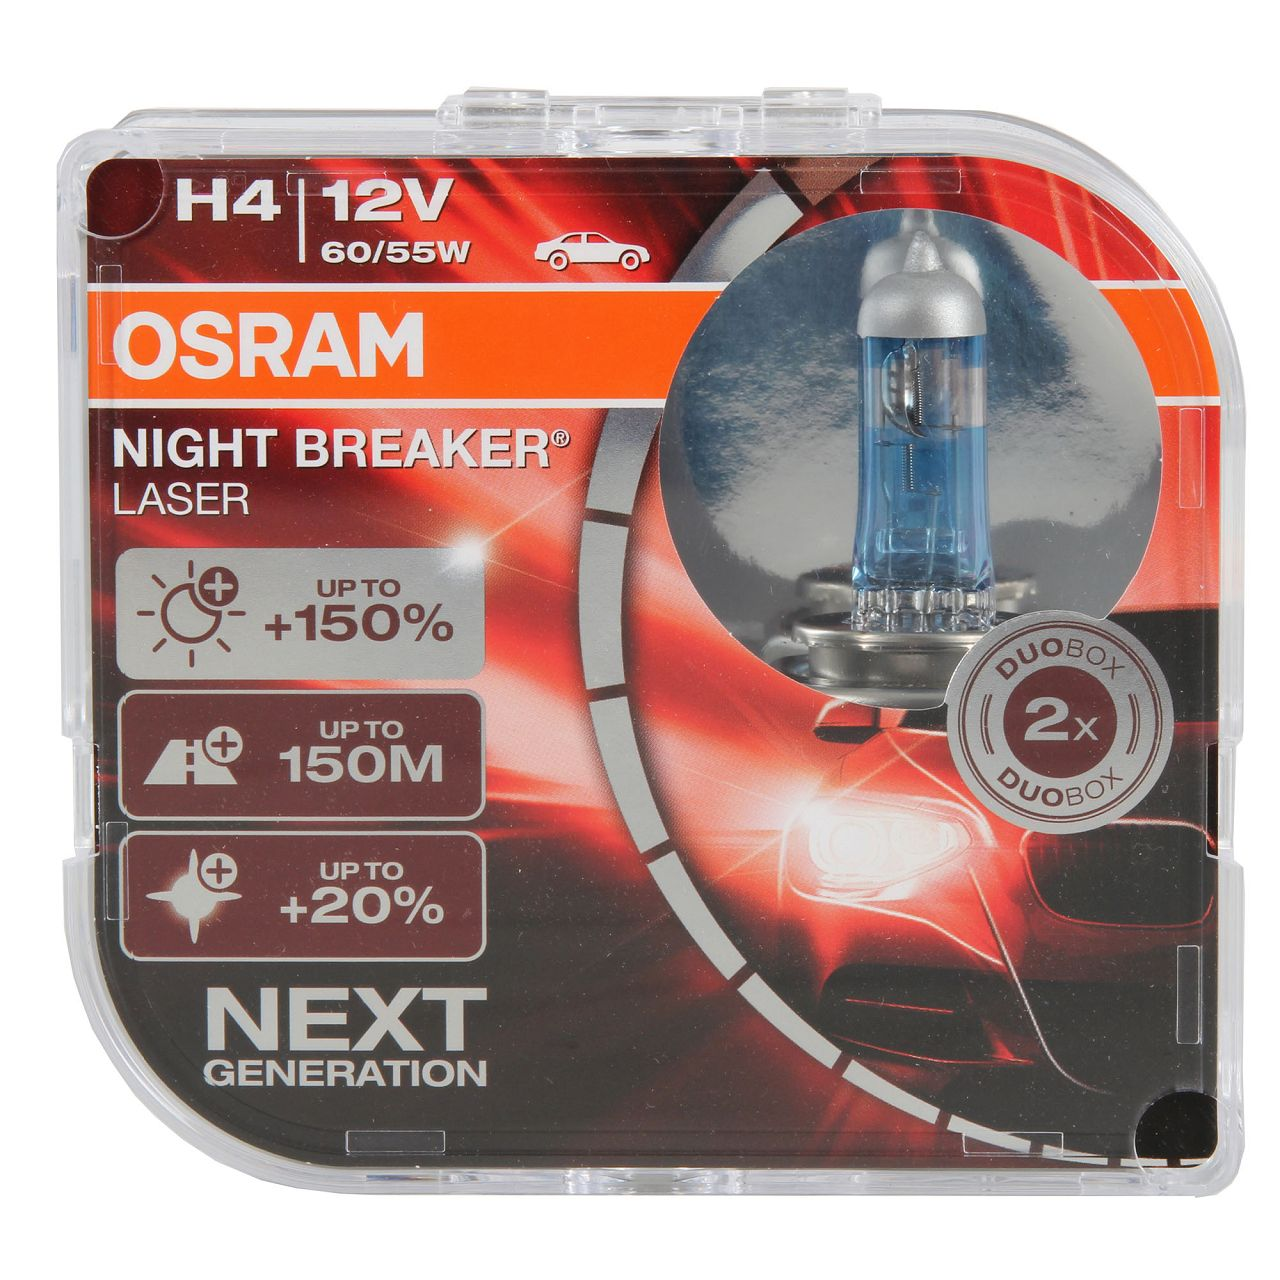 2x OSRAM Glühlampe H4 NIGHT BREAKER LASER 12V 60/55W P43t next Generation +150%